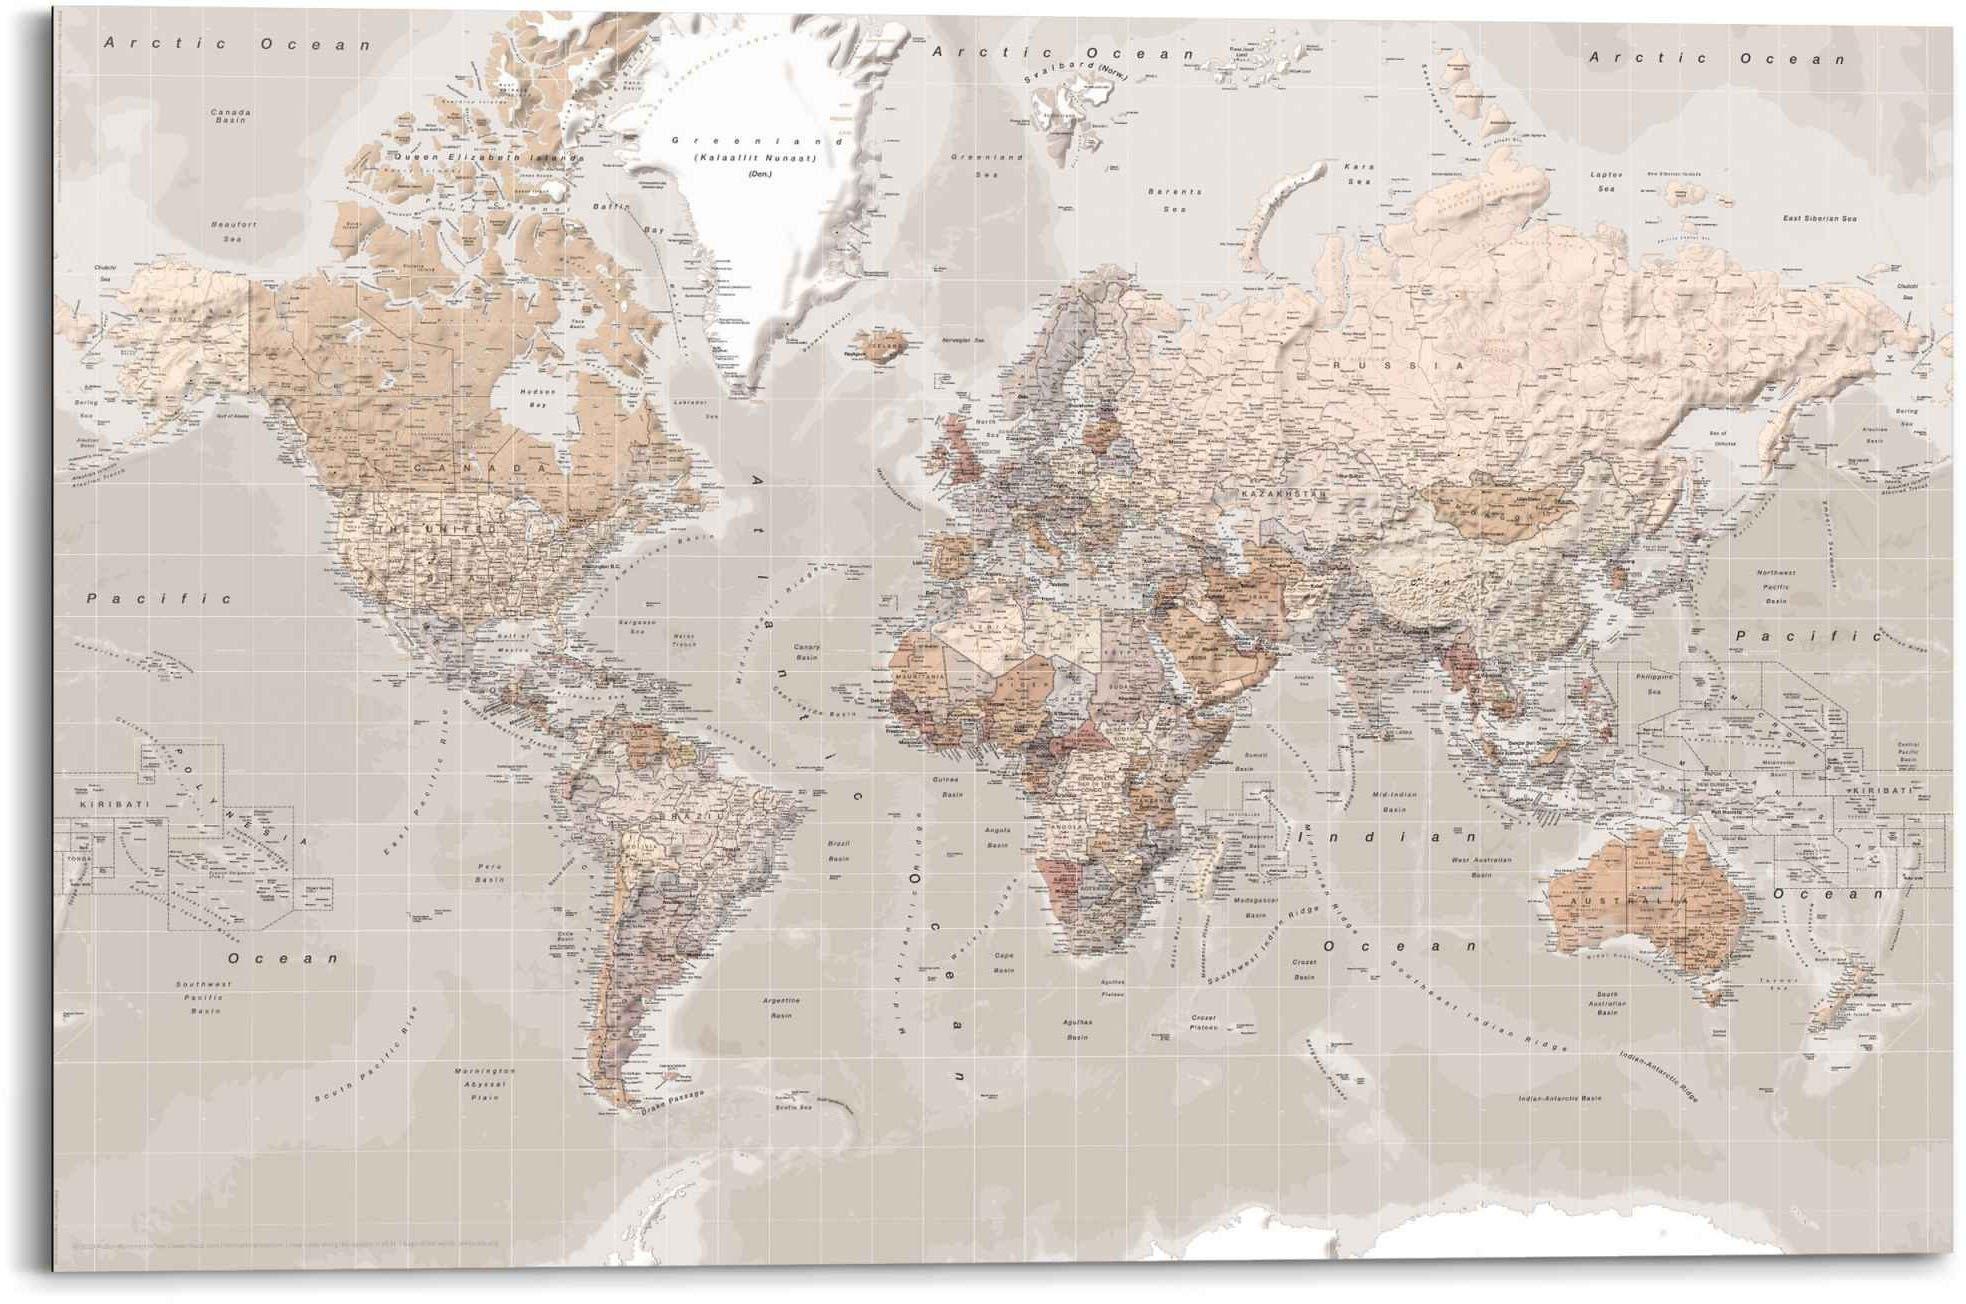 Reinders! artprint Wandbild Weltkarte Natürlicher Farbton - Erdfarben - Detailliert (1 stuk) in de webshop van OTTO kopen